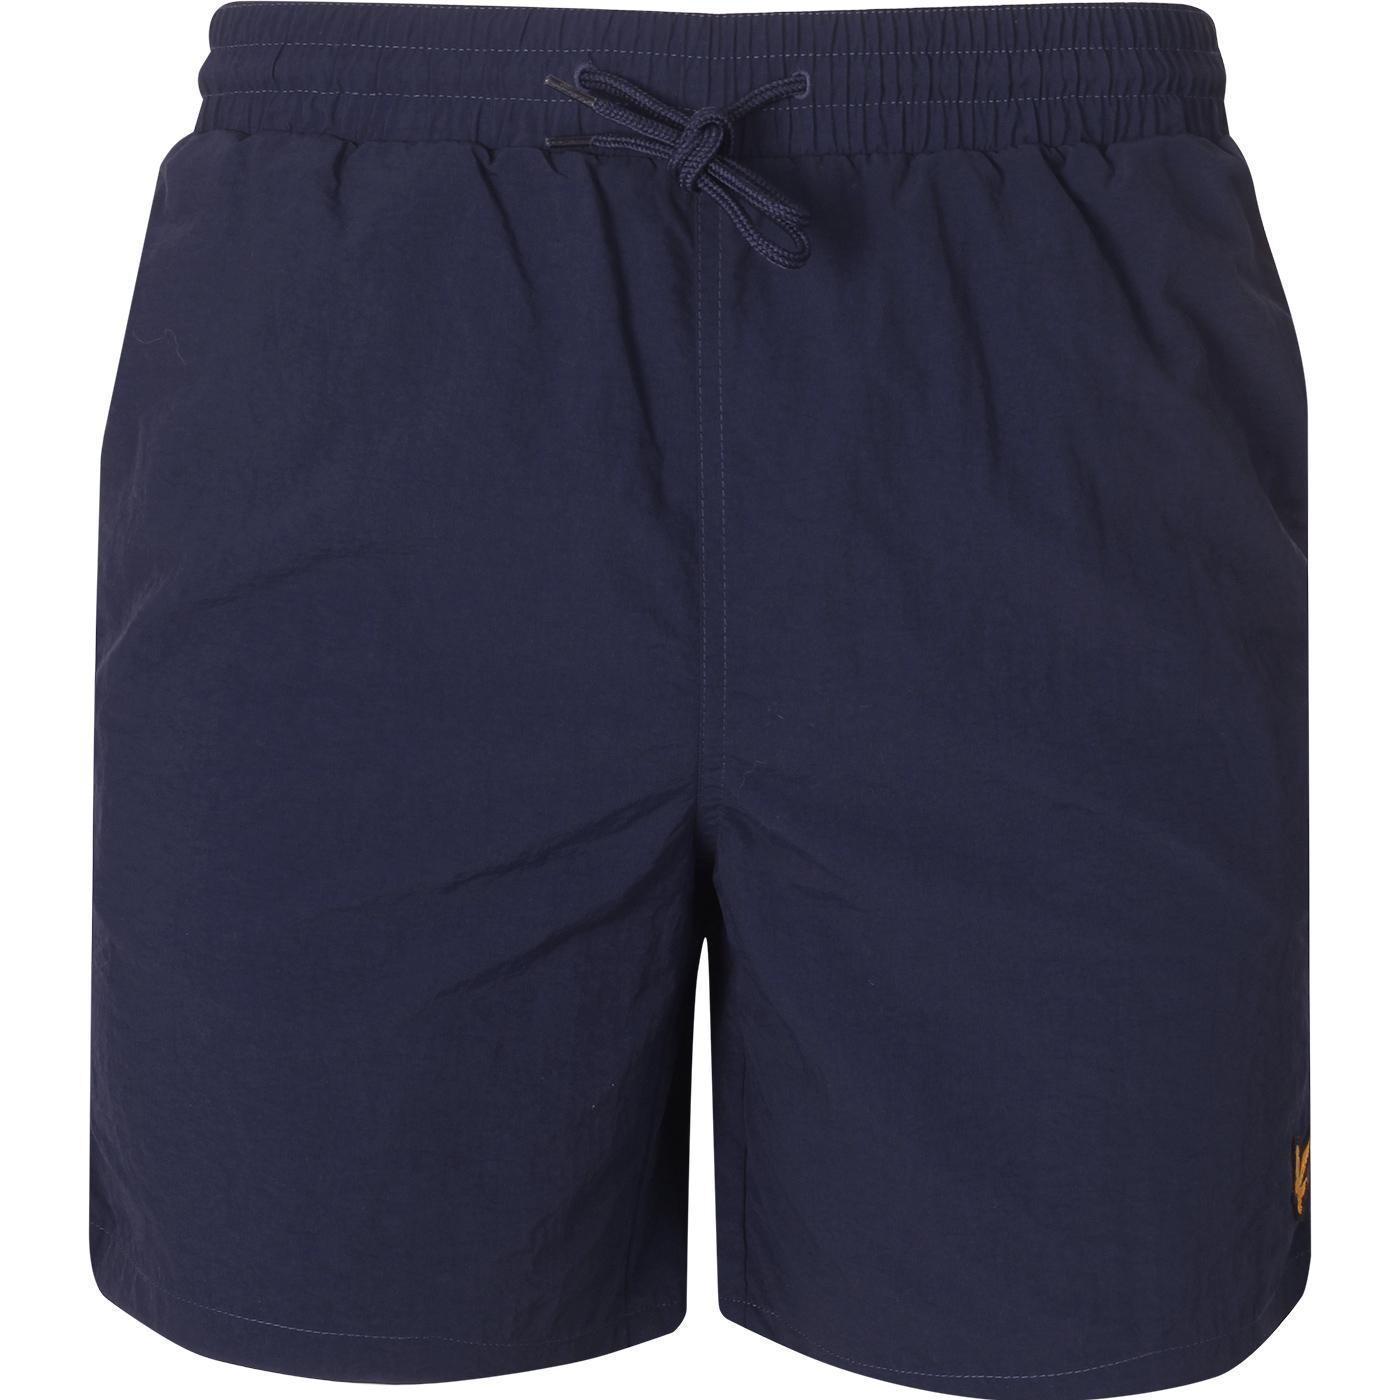 LYLE & SCOTT Men's Plain Retro Swim Shorts (Navy)